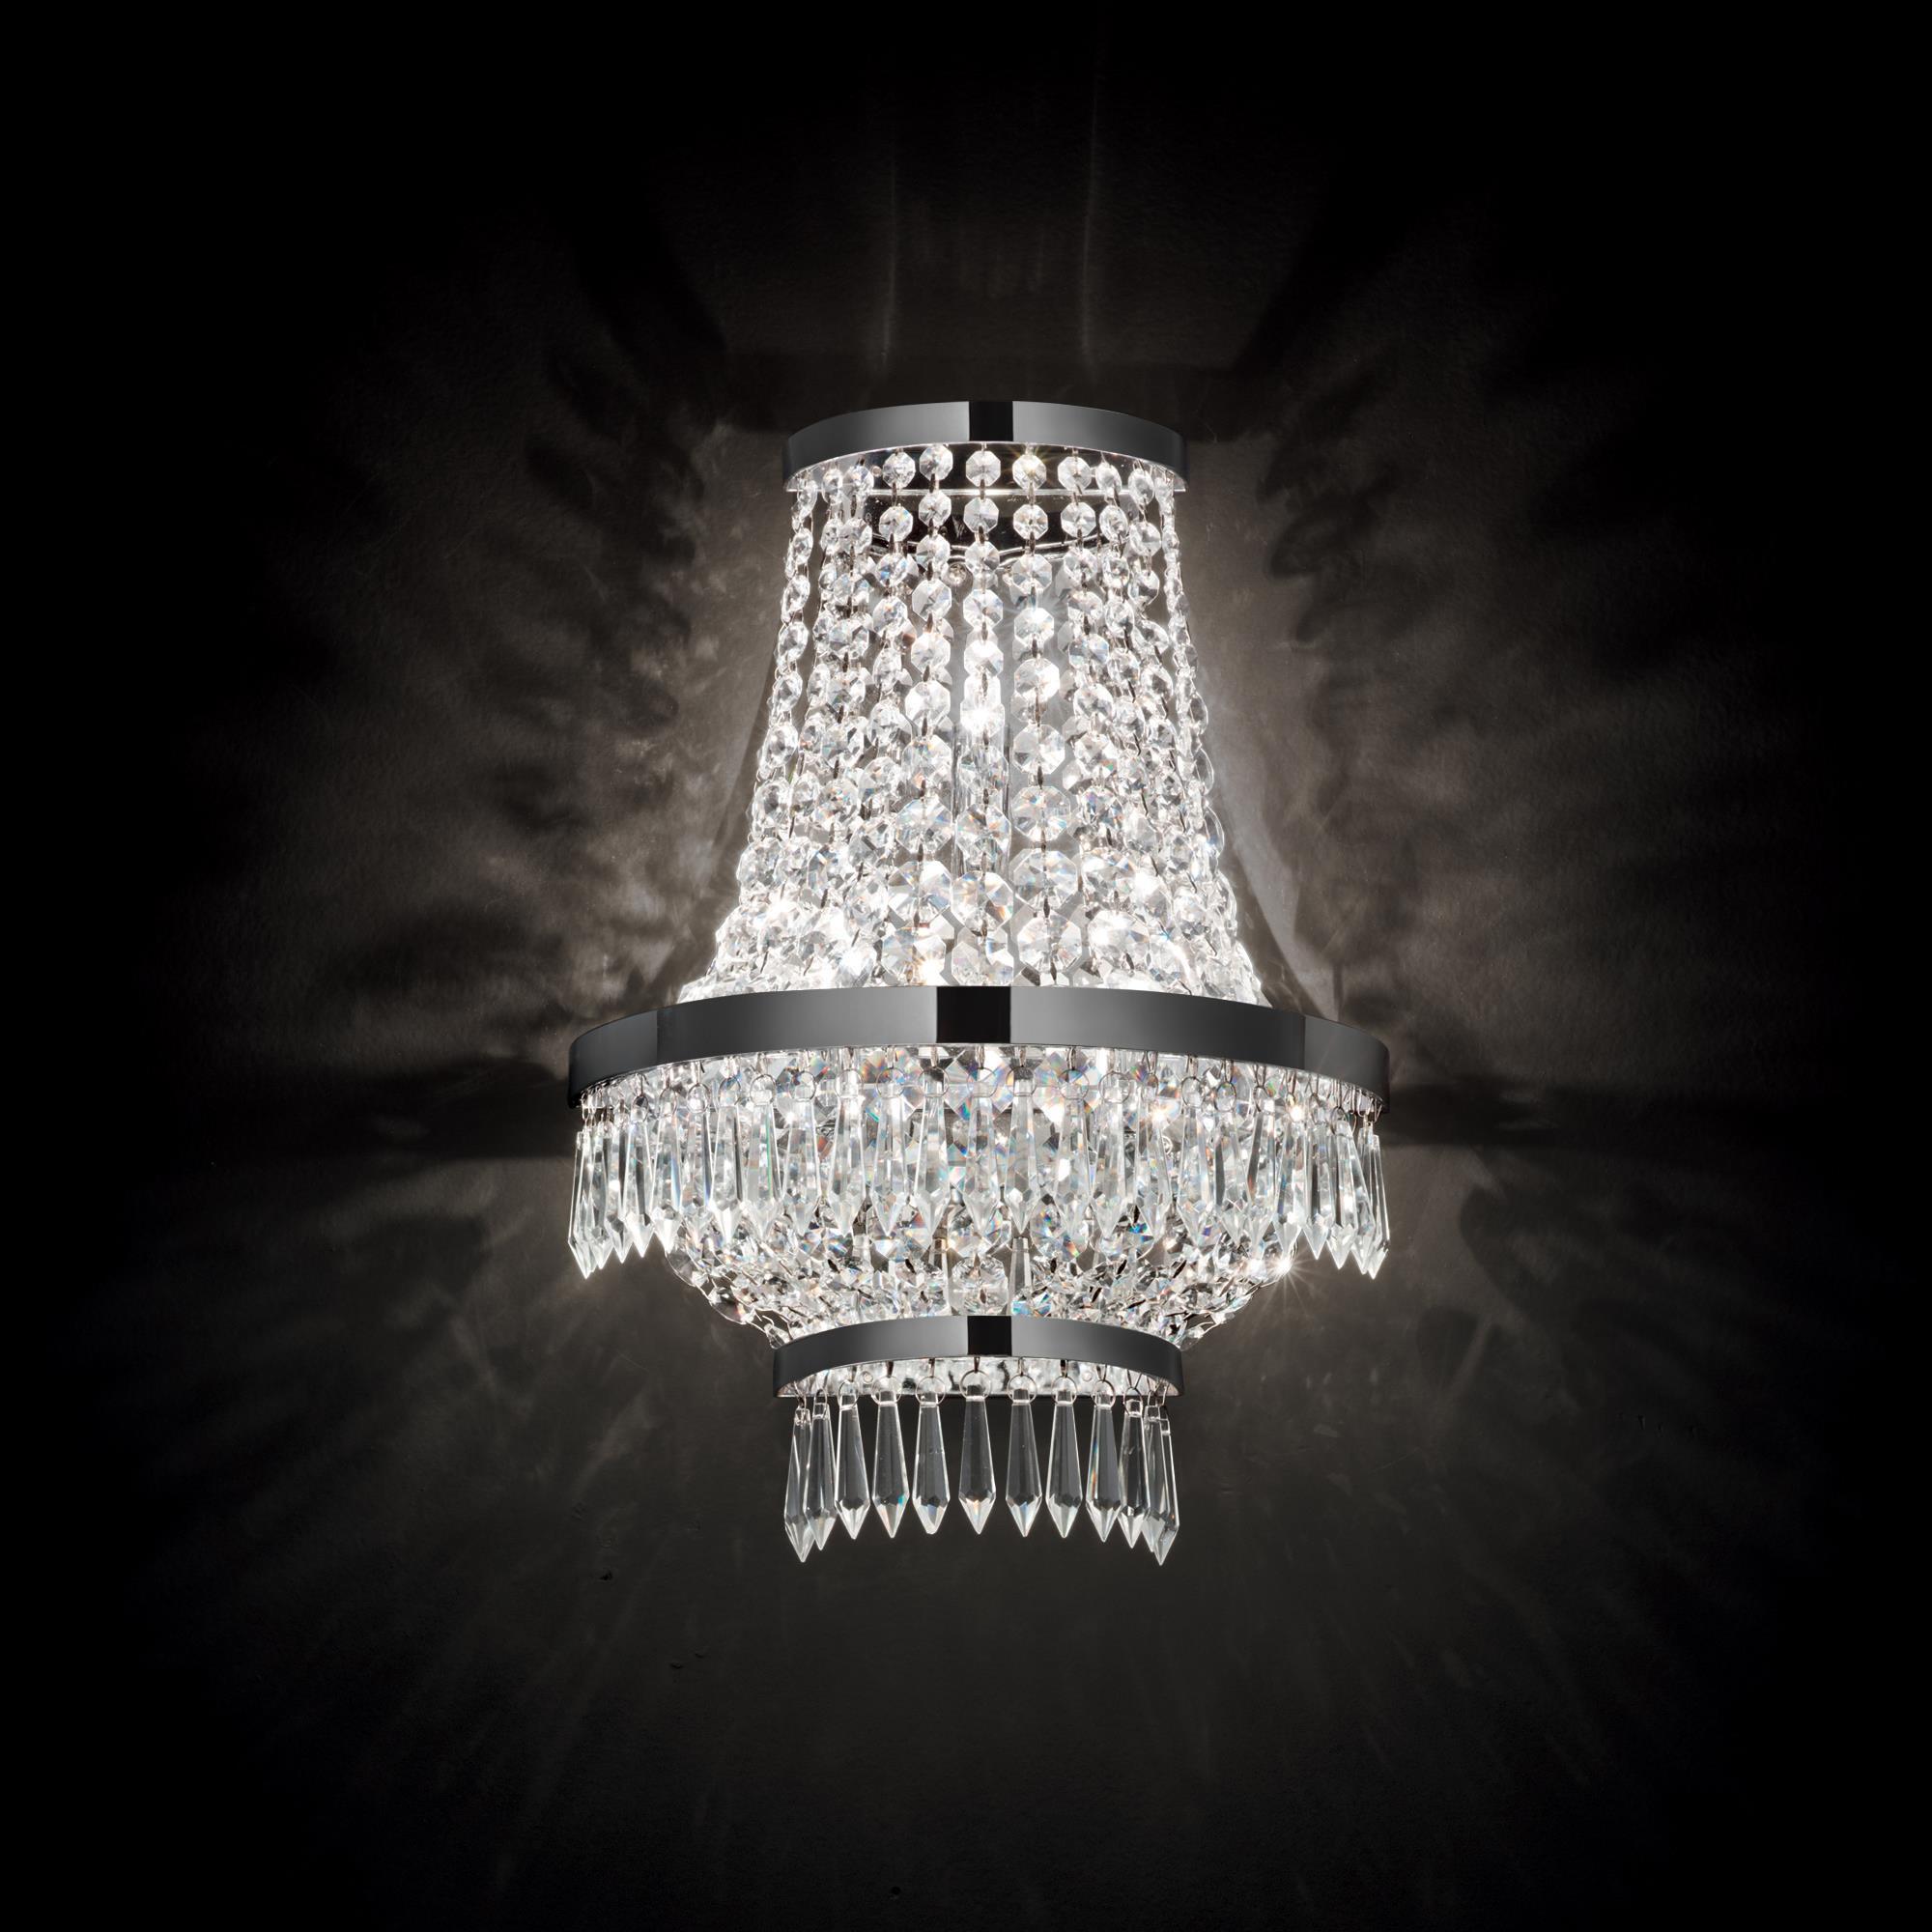 Ideal Lux 137698 CAESAR AP3 CROMO kristály falilámpa